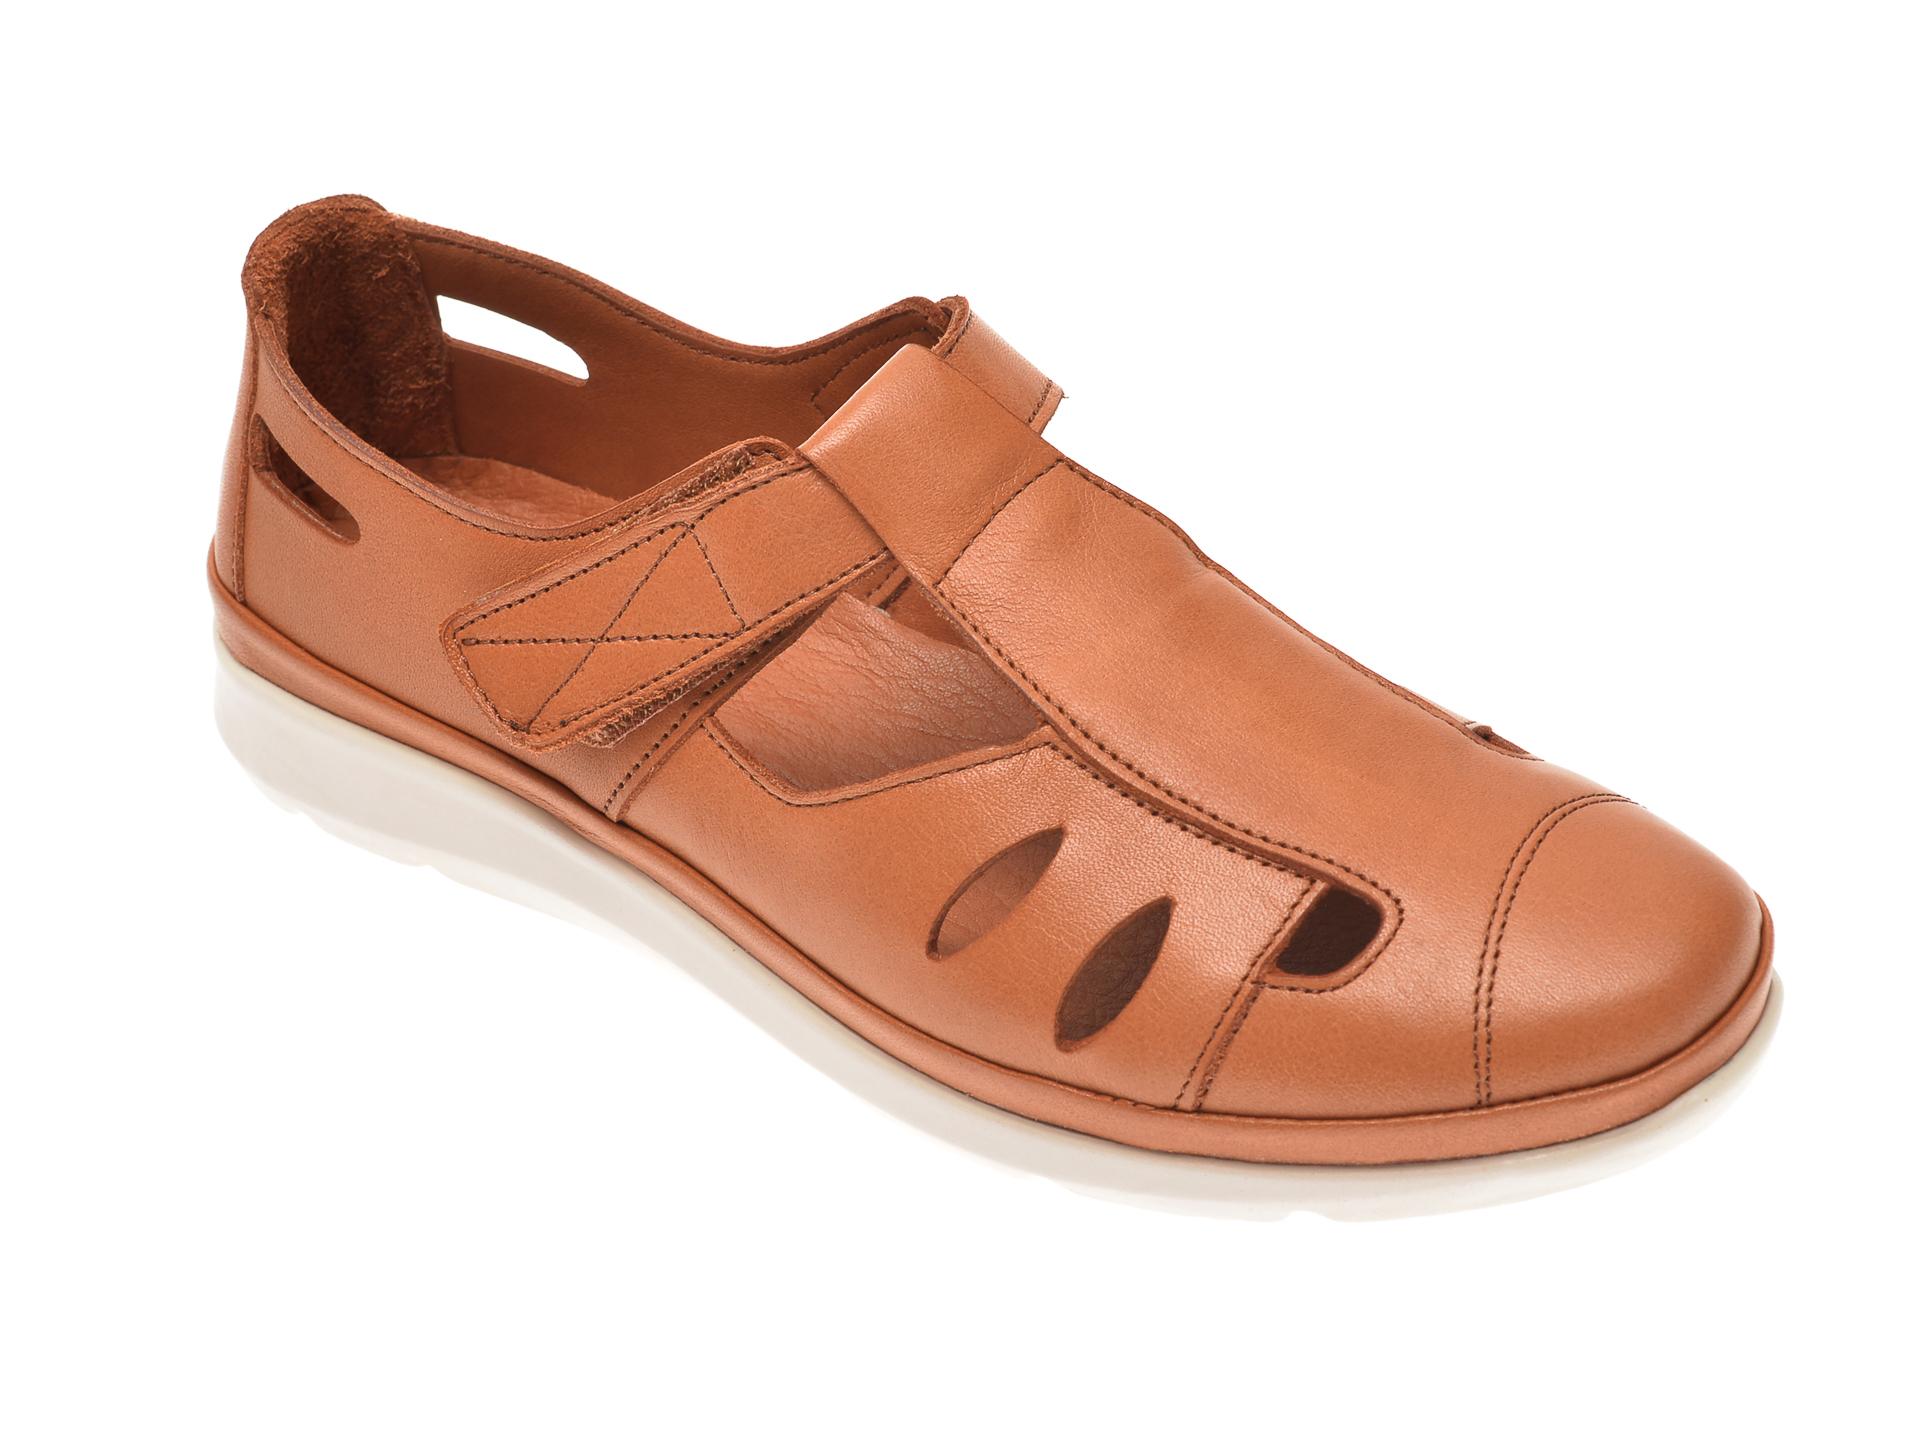 Pantofi MARCHA maro, 605, din piele naturala